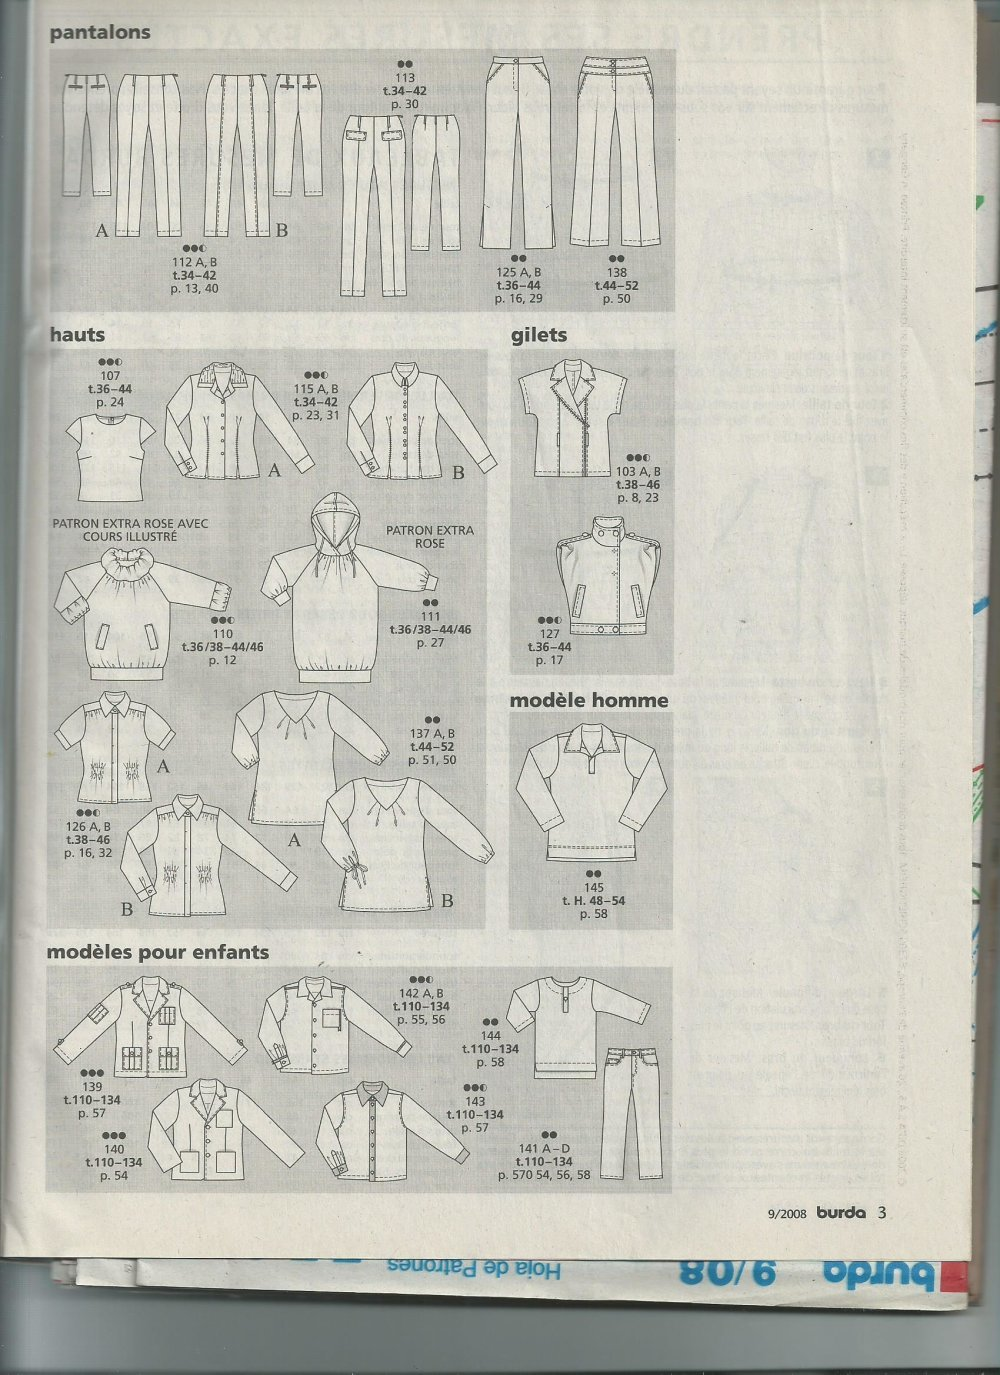 Burda tendance mode N° 105